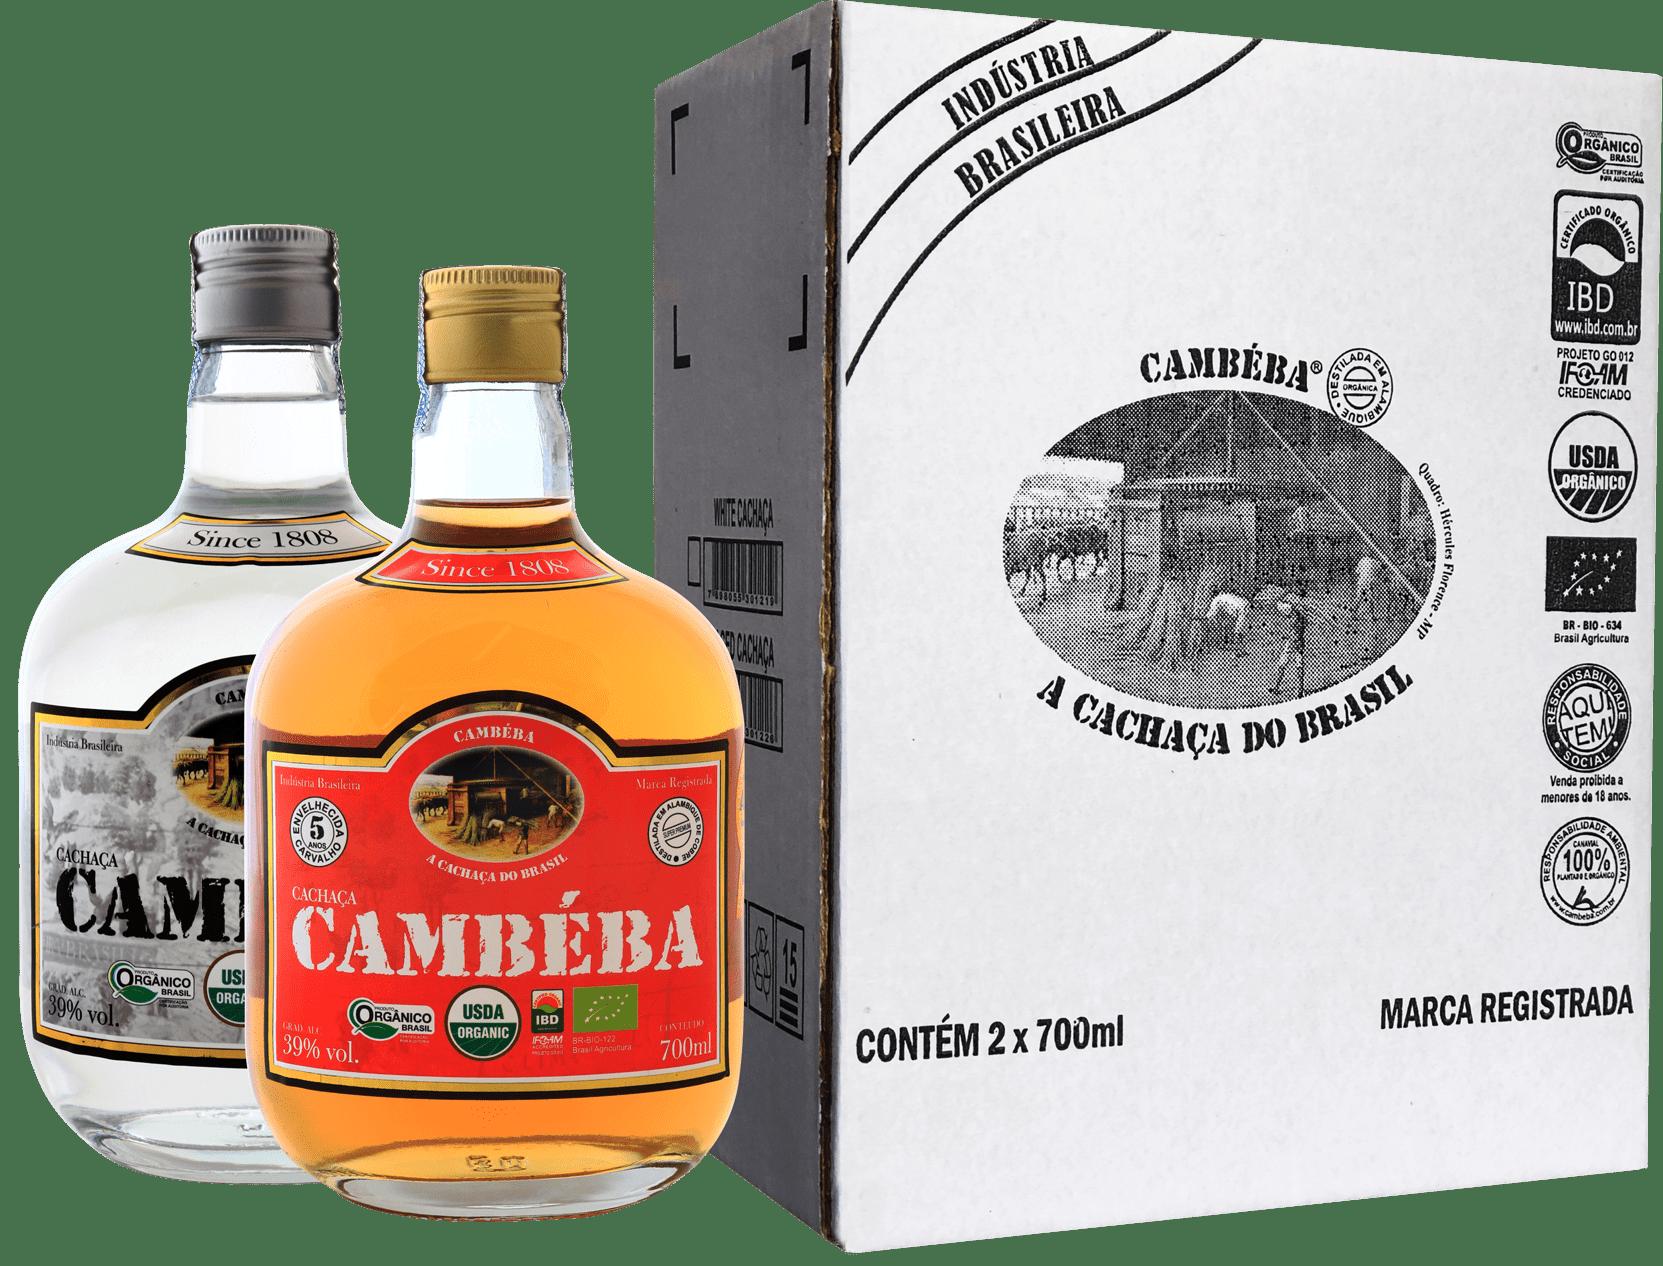 Kit cachaça Cambéba: 1 Premium + 1 Branca - 700 ml